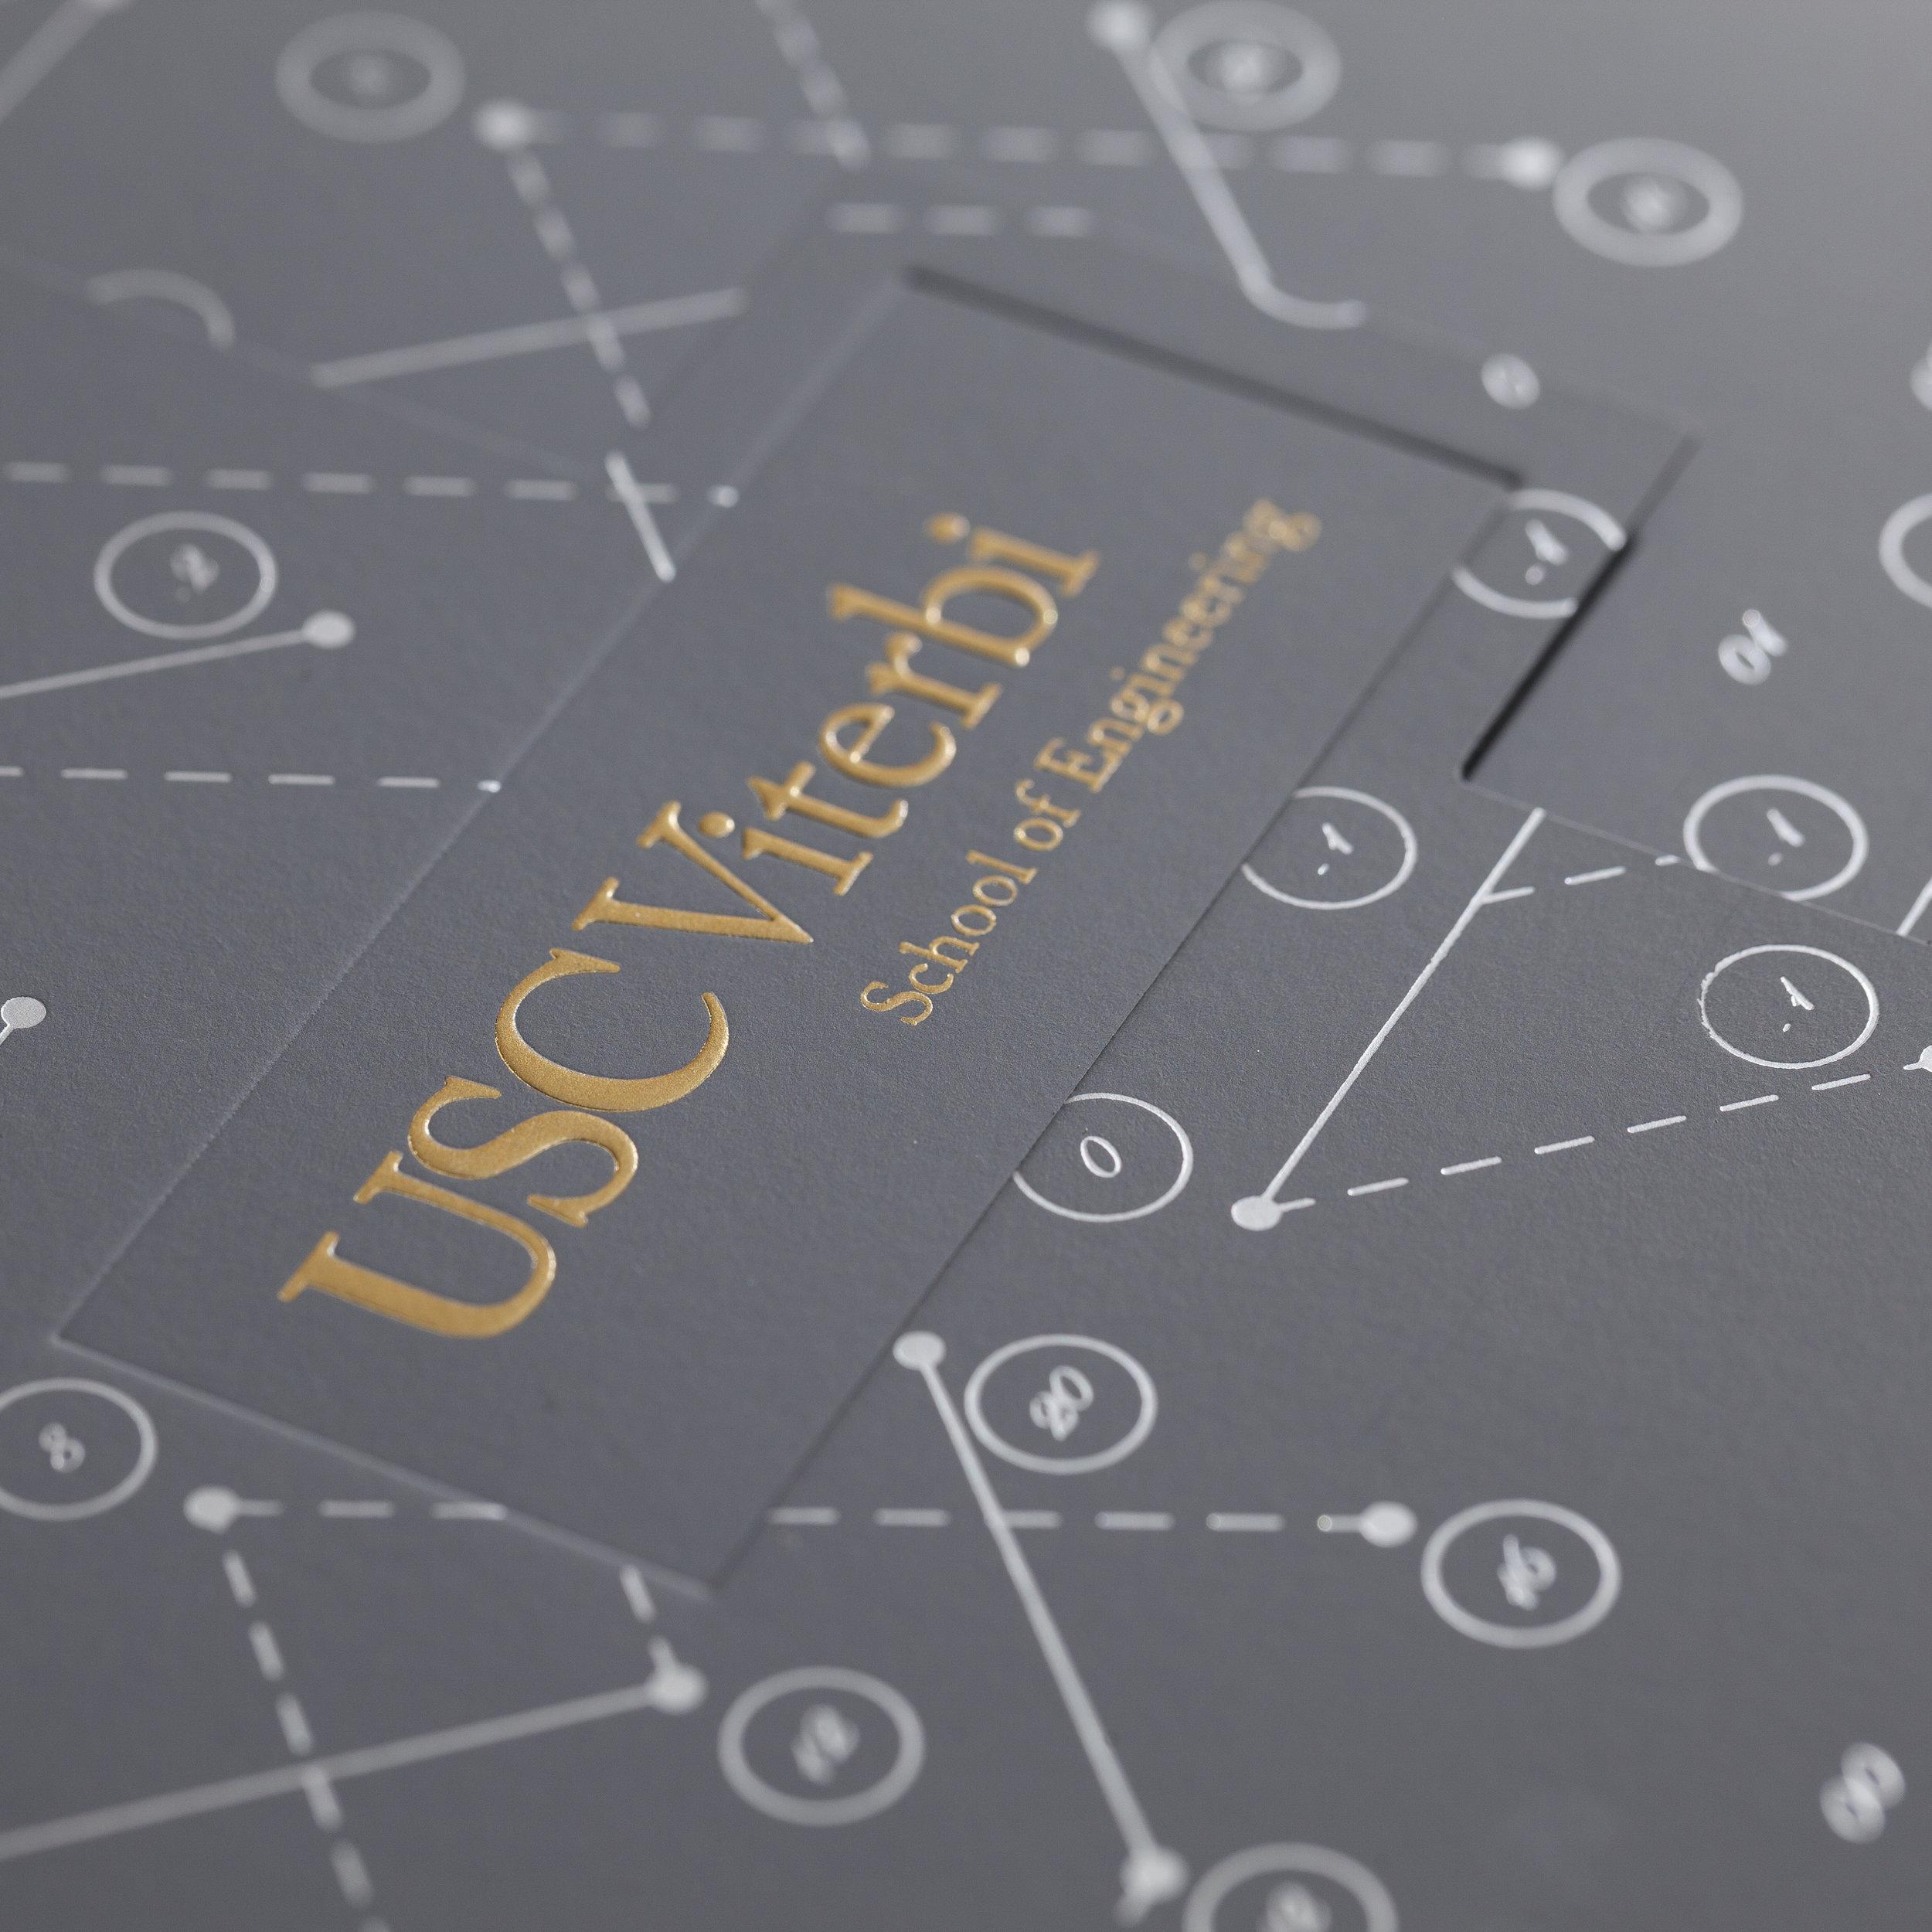 USC Viterbi School of Engineering Invitation